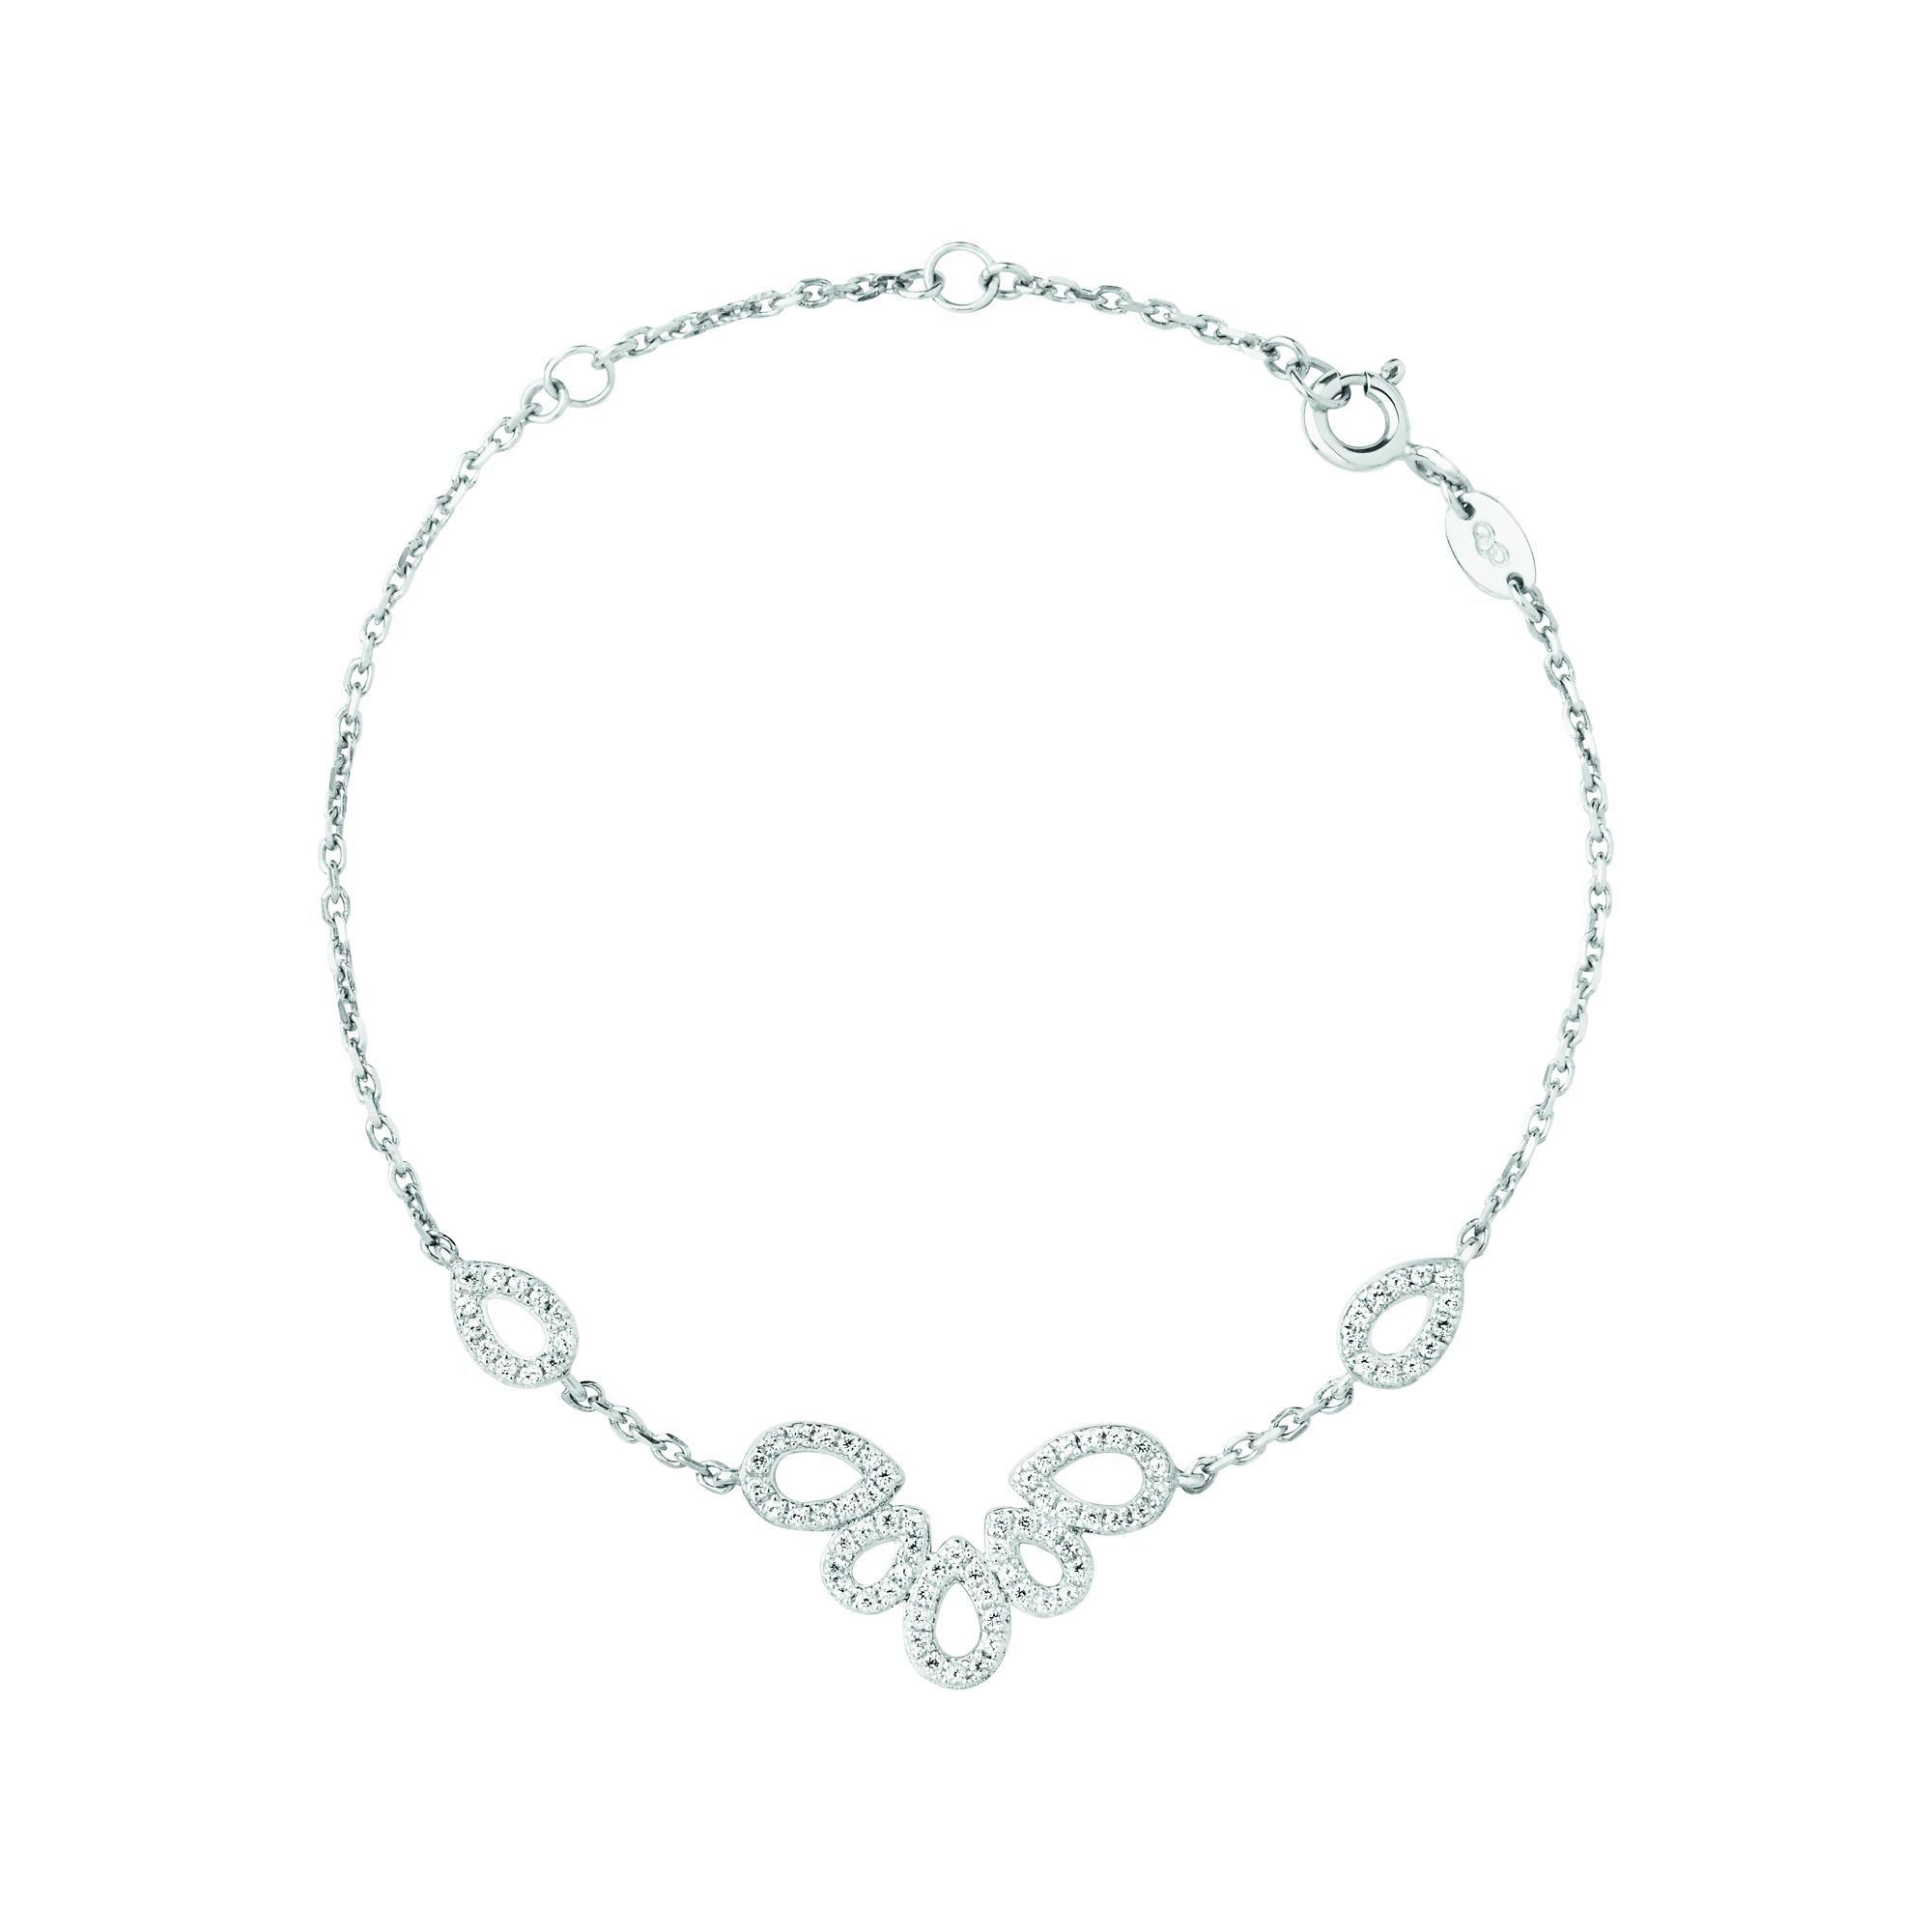 LINKS OF LONDON - Ασημένιο βραχιόλι Outlet Peardrops γυναικεία αξεσουάρ κοσμήματα βραχιόλια